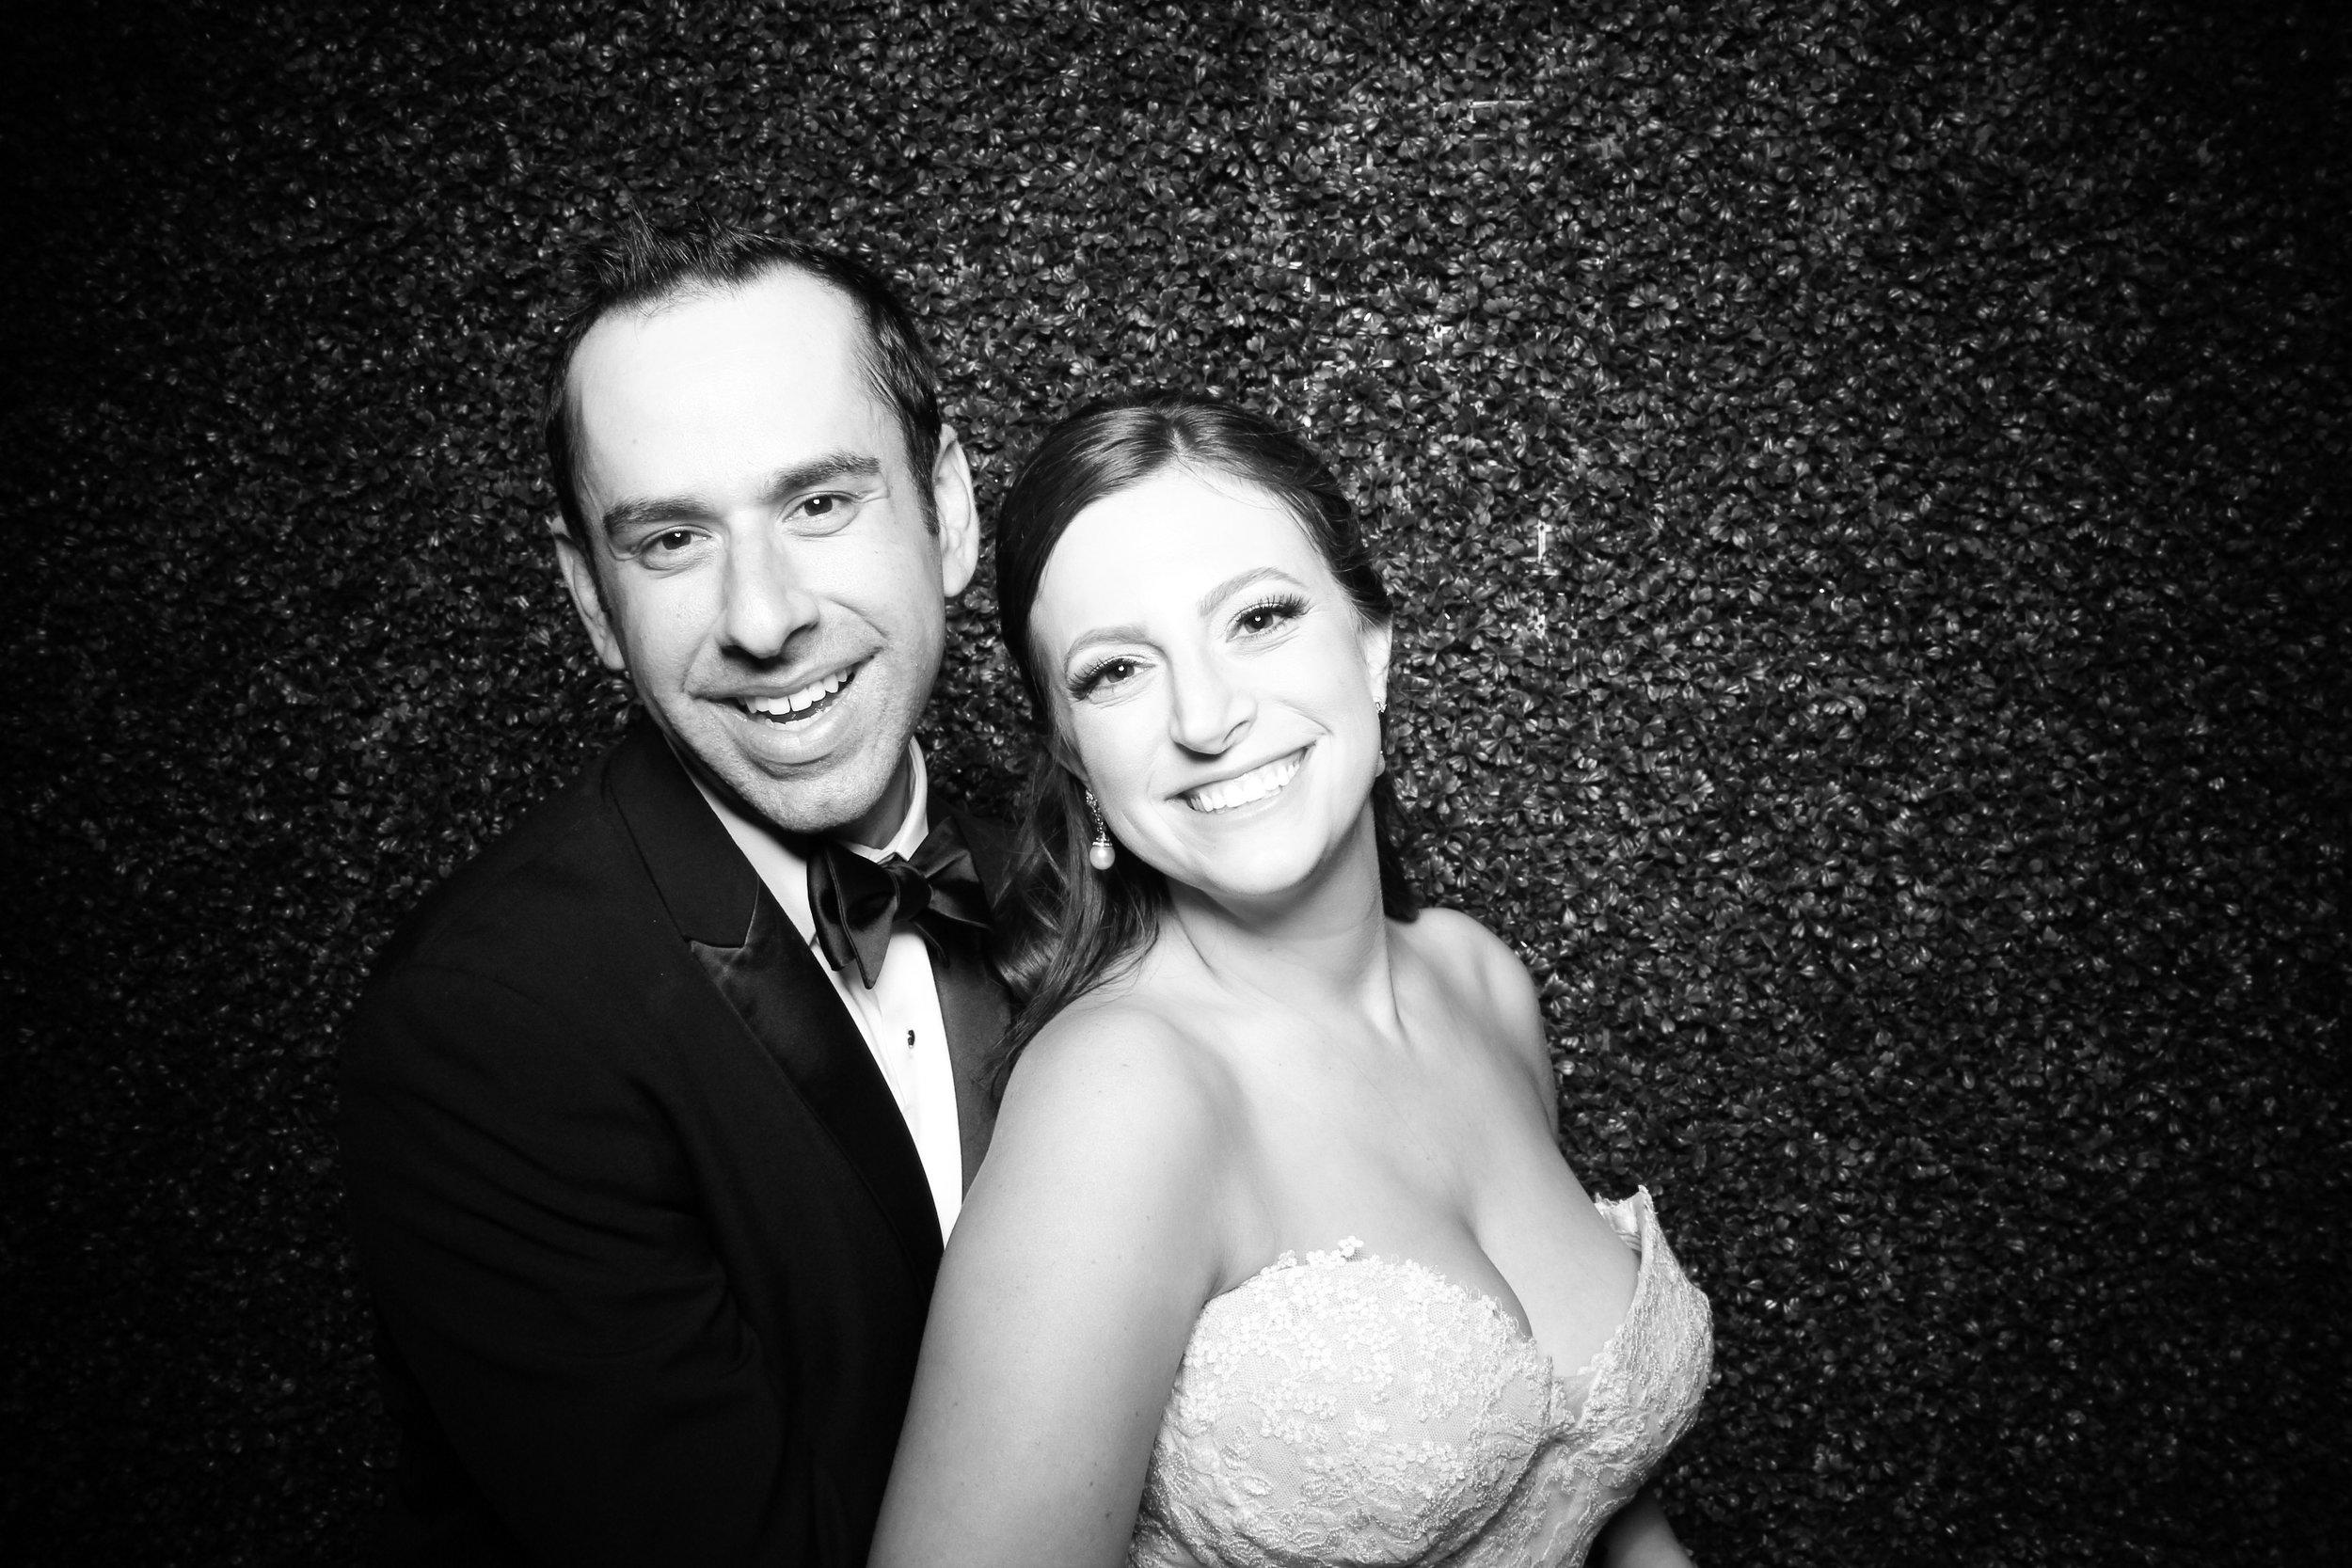 Ivy_Room_Chicago_Wedding_Reception_Photo_Booth_Rental__04.jpg